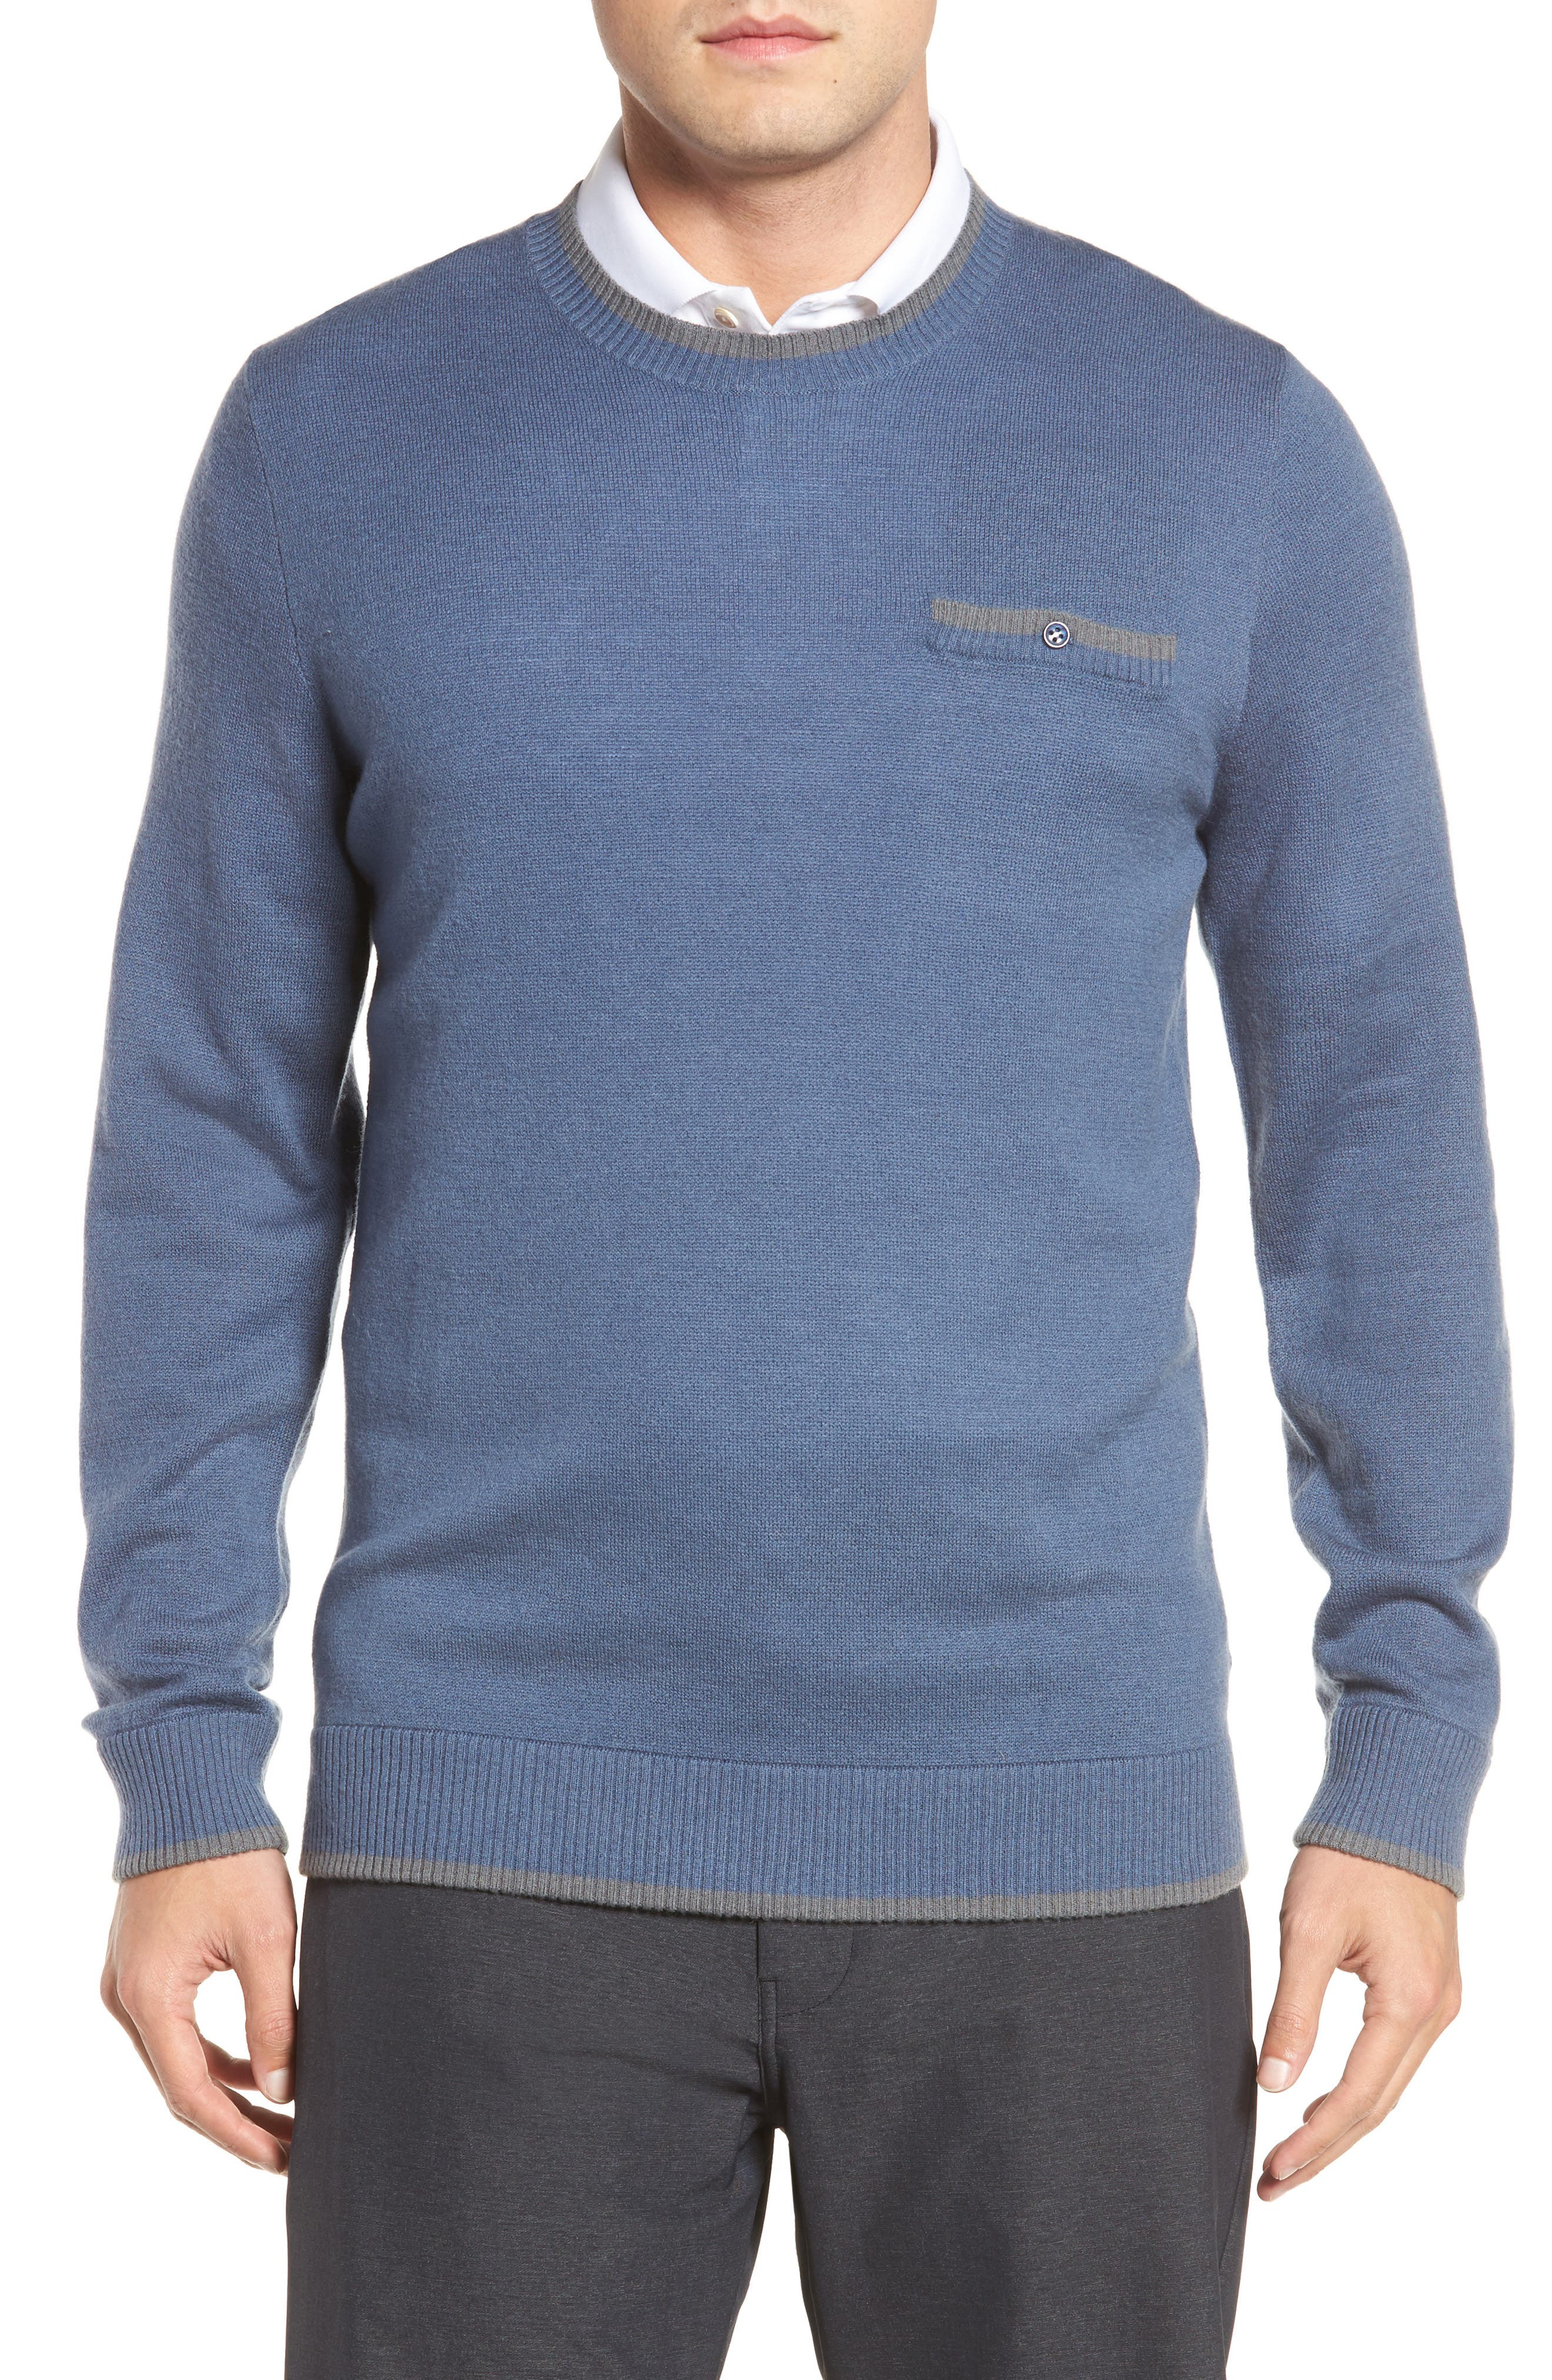 Paglia Wool Blend Sweater,                             Main thumbnail 1, color,                             Vintage Indigo